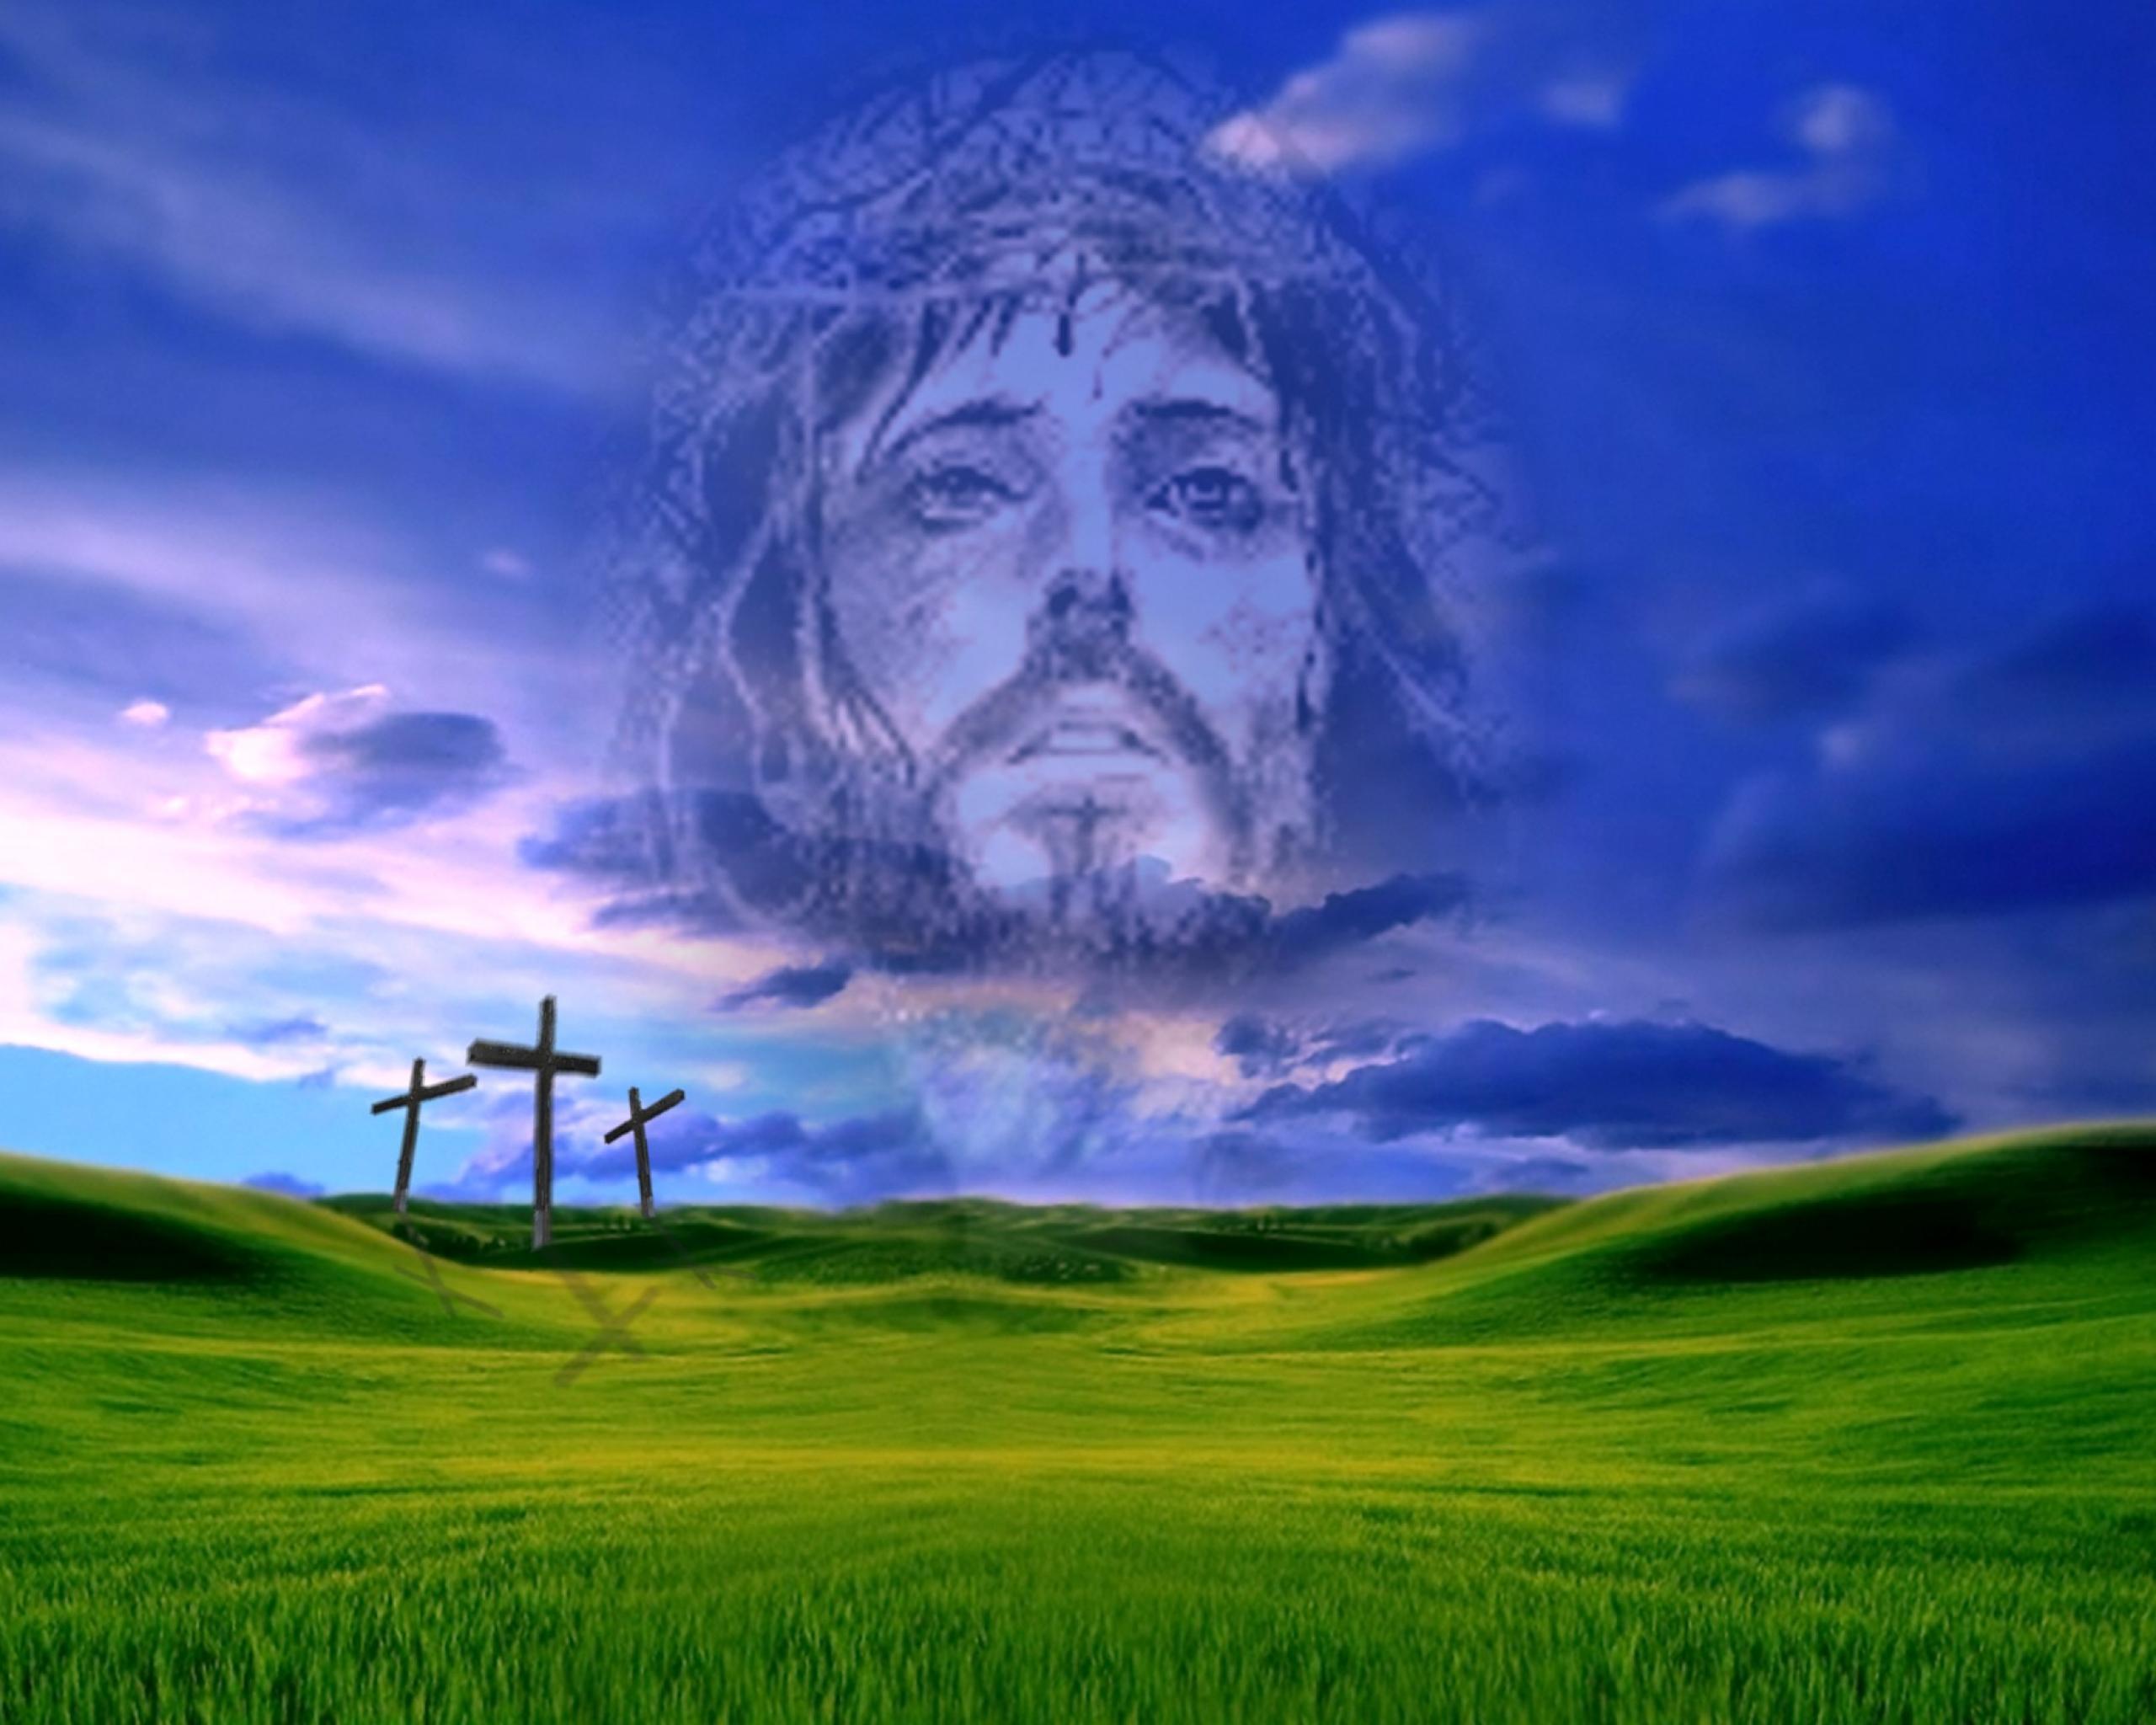 free download jesus cristo imagenes fondo pantallas hd wallpaper 2560x2048